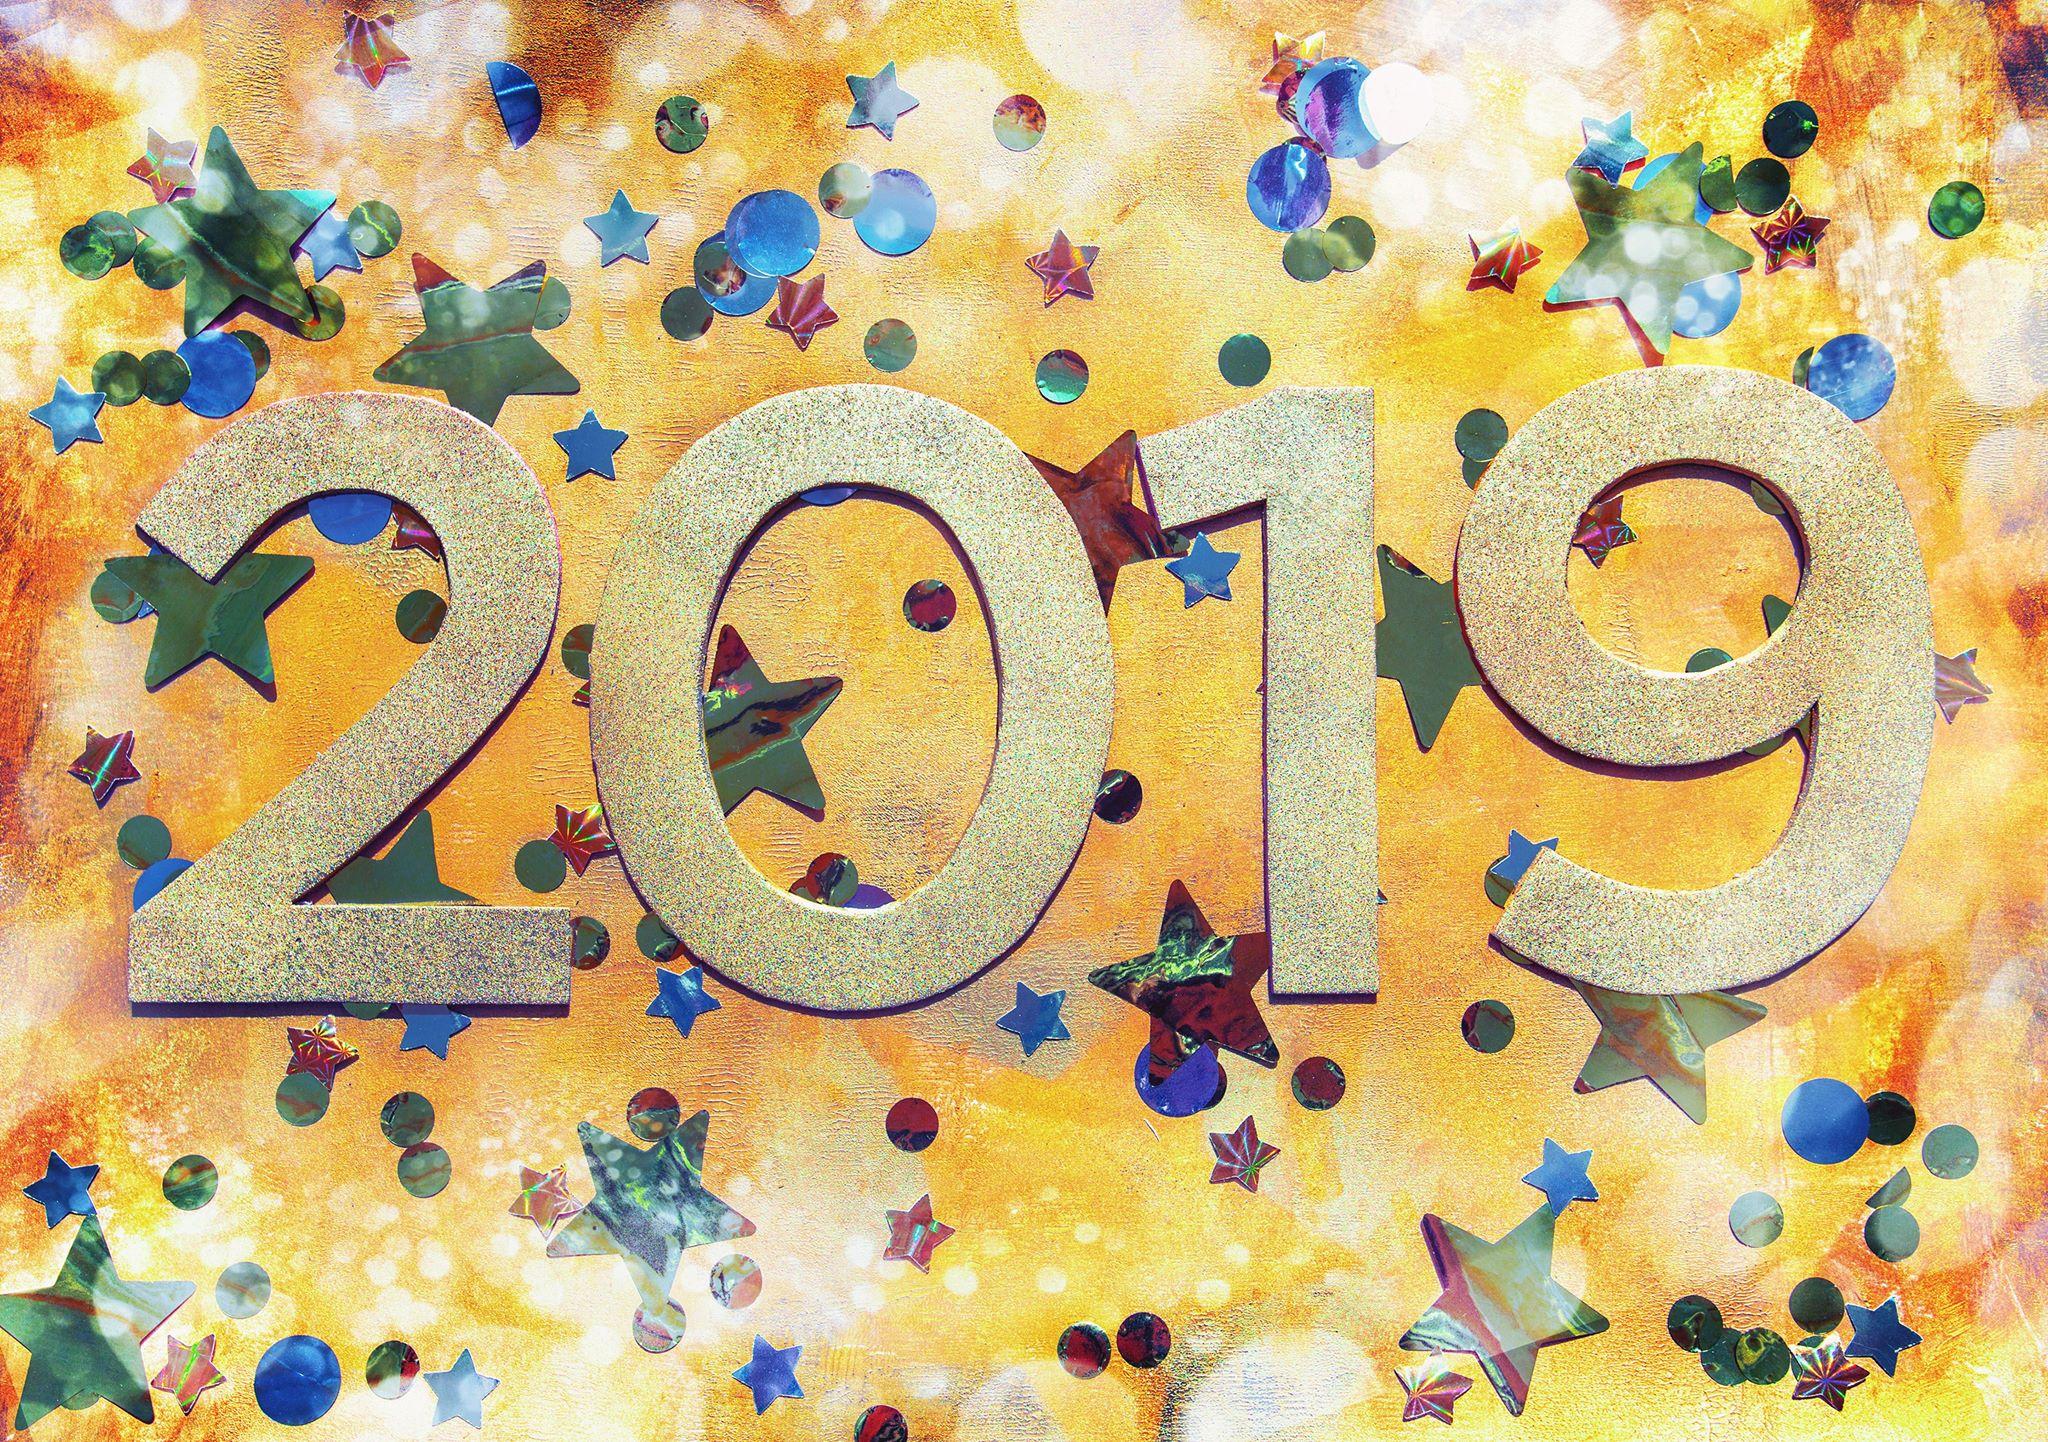 happy new year 2019 5 صور مكتوب عليها العام الجديد 2019